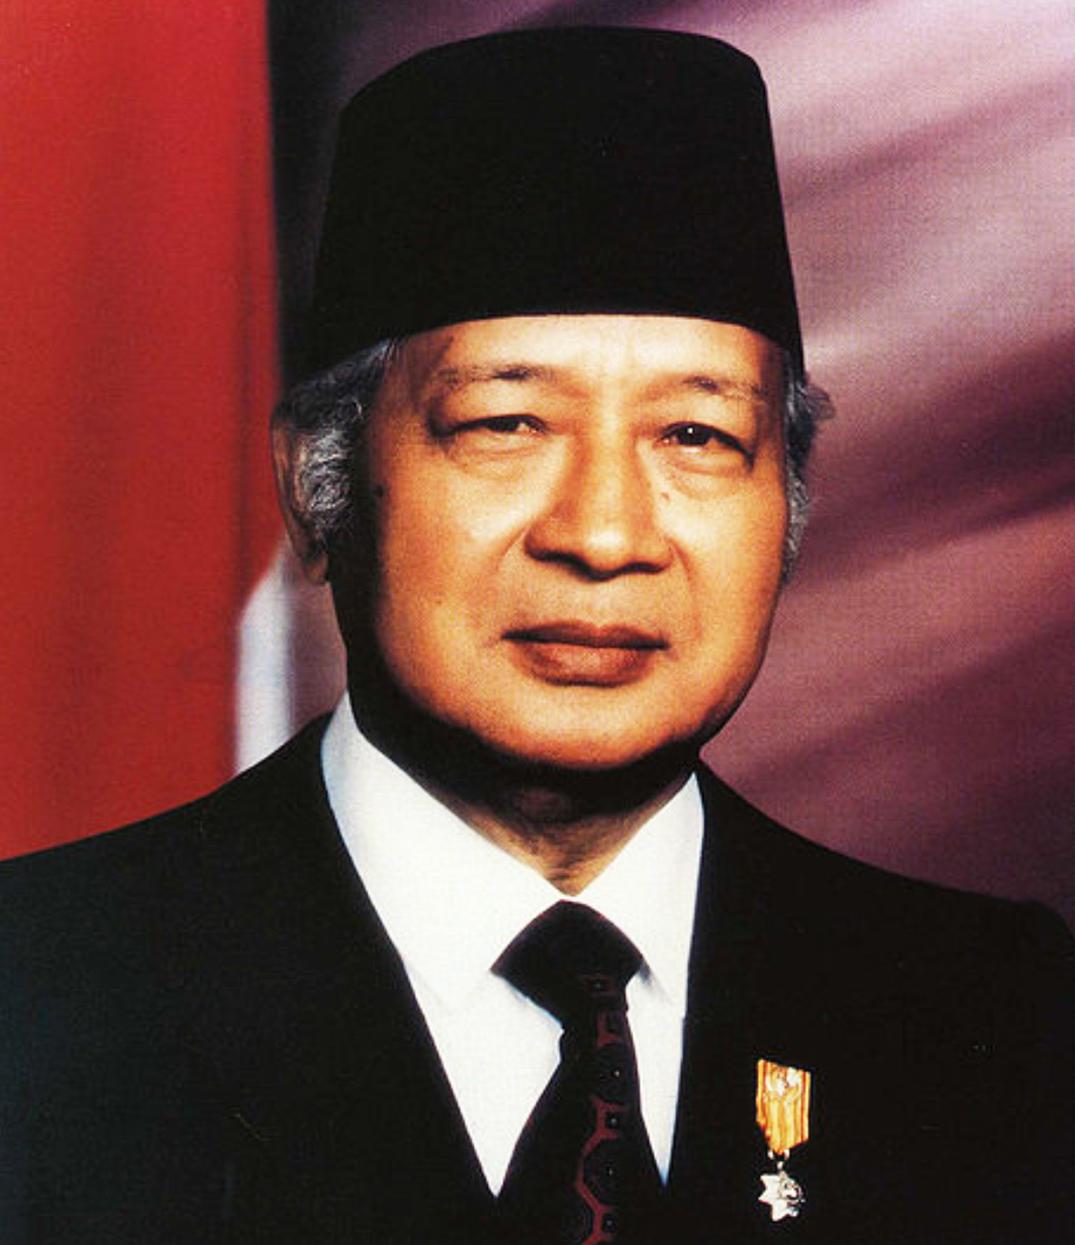 Presiden Soeharto berwarna